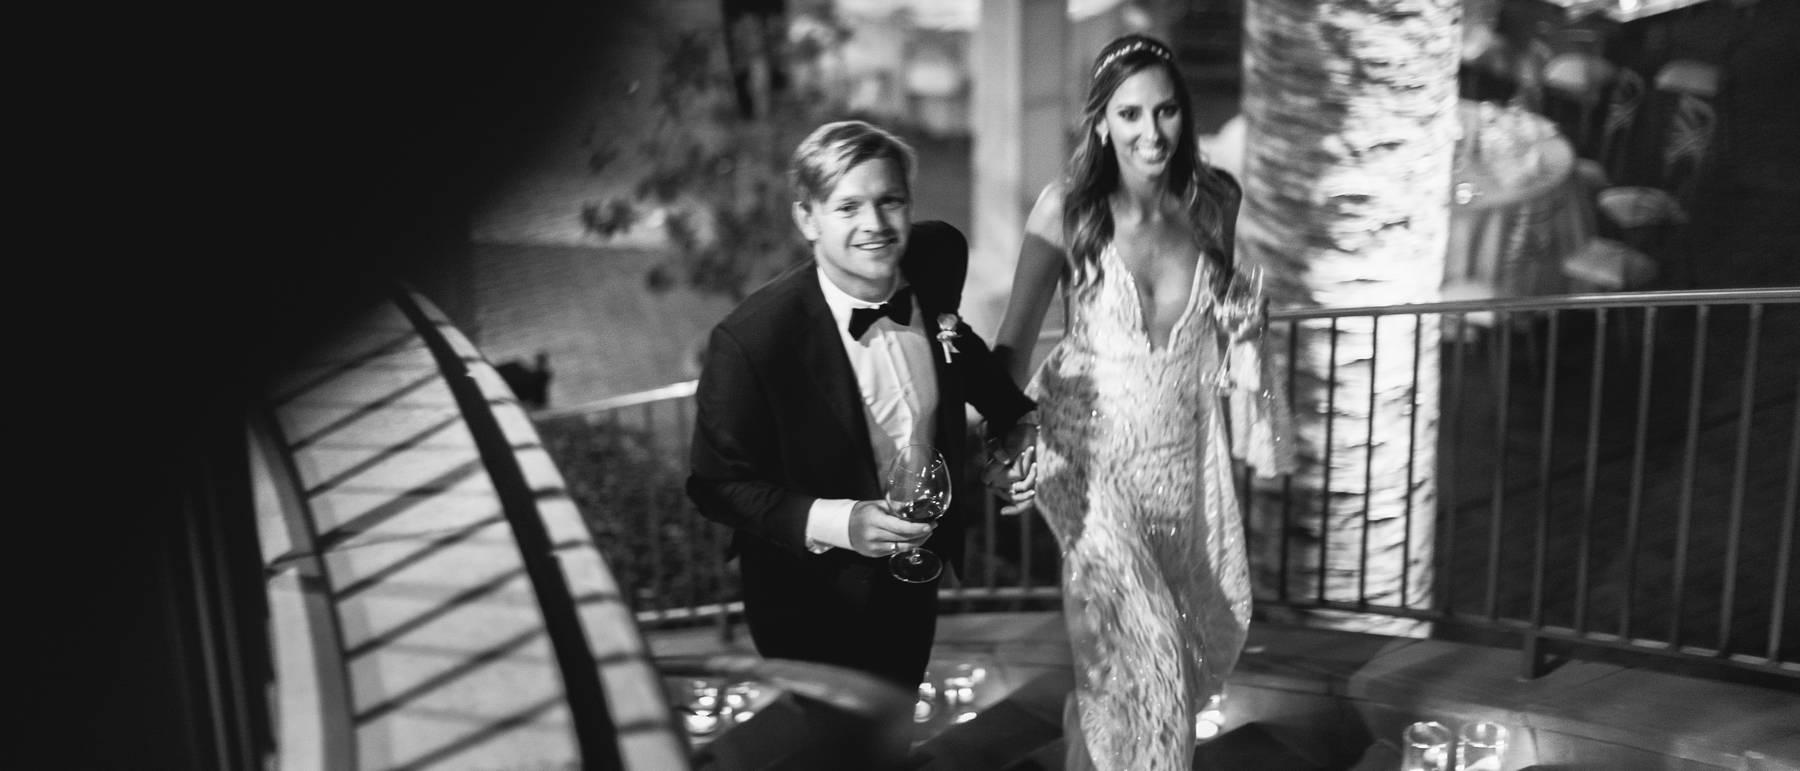 johnandjoseph-wedding-photographer-hz-slider-268